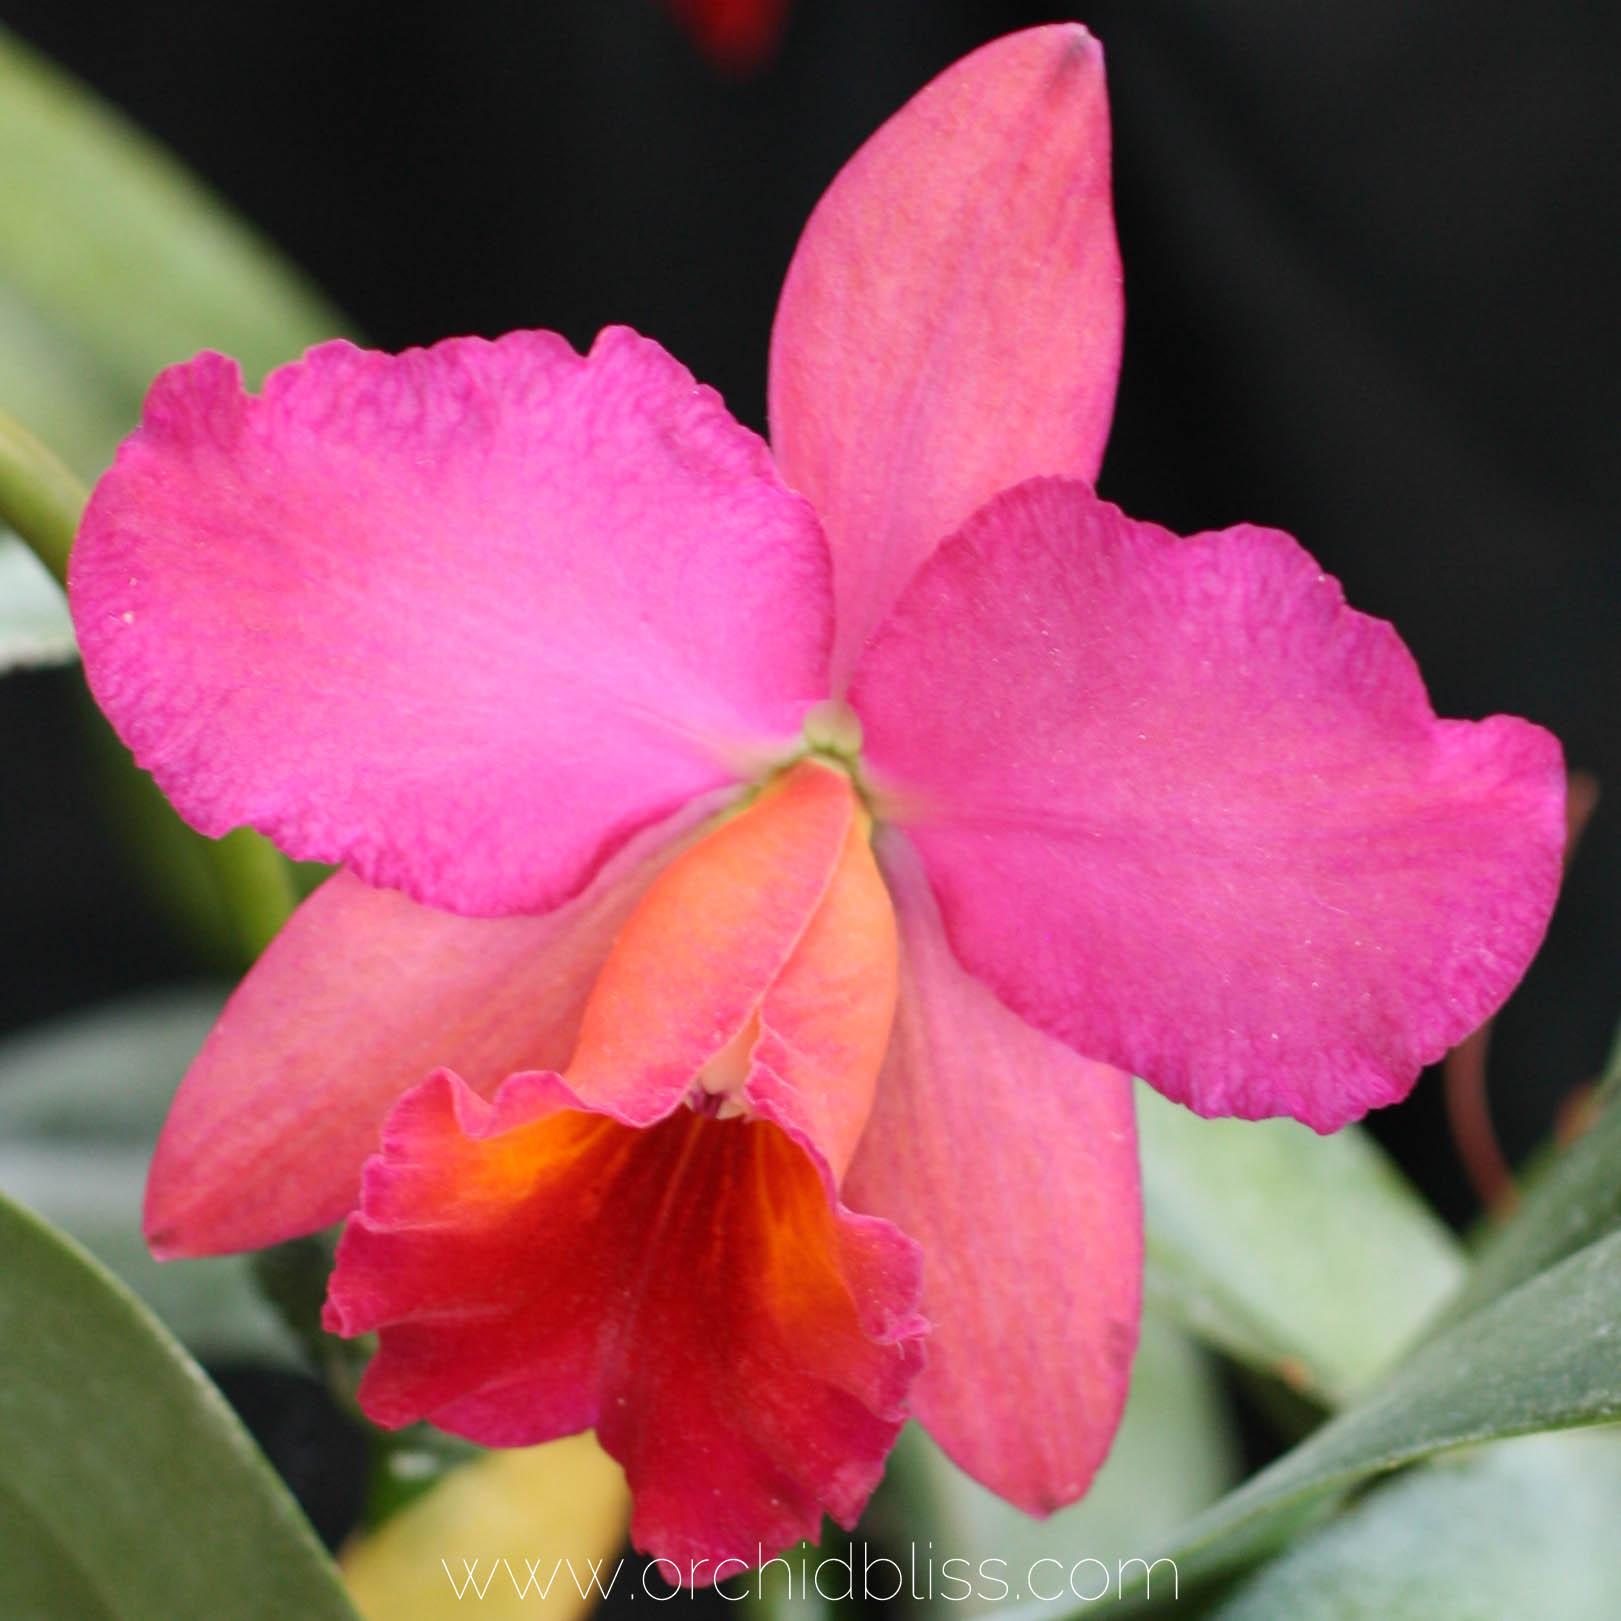 cattleya orchid in bloom